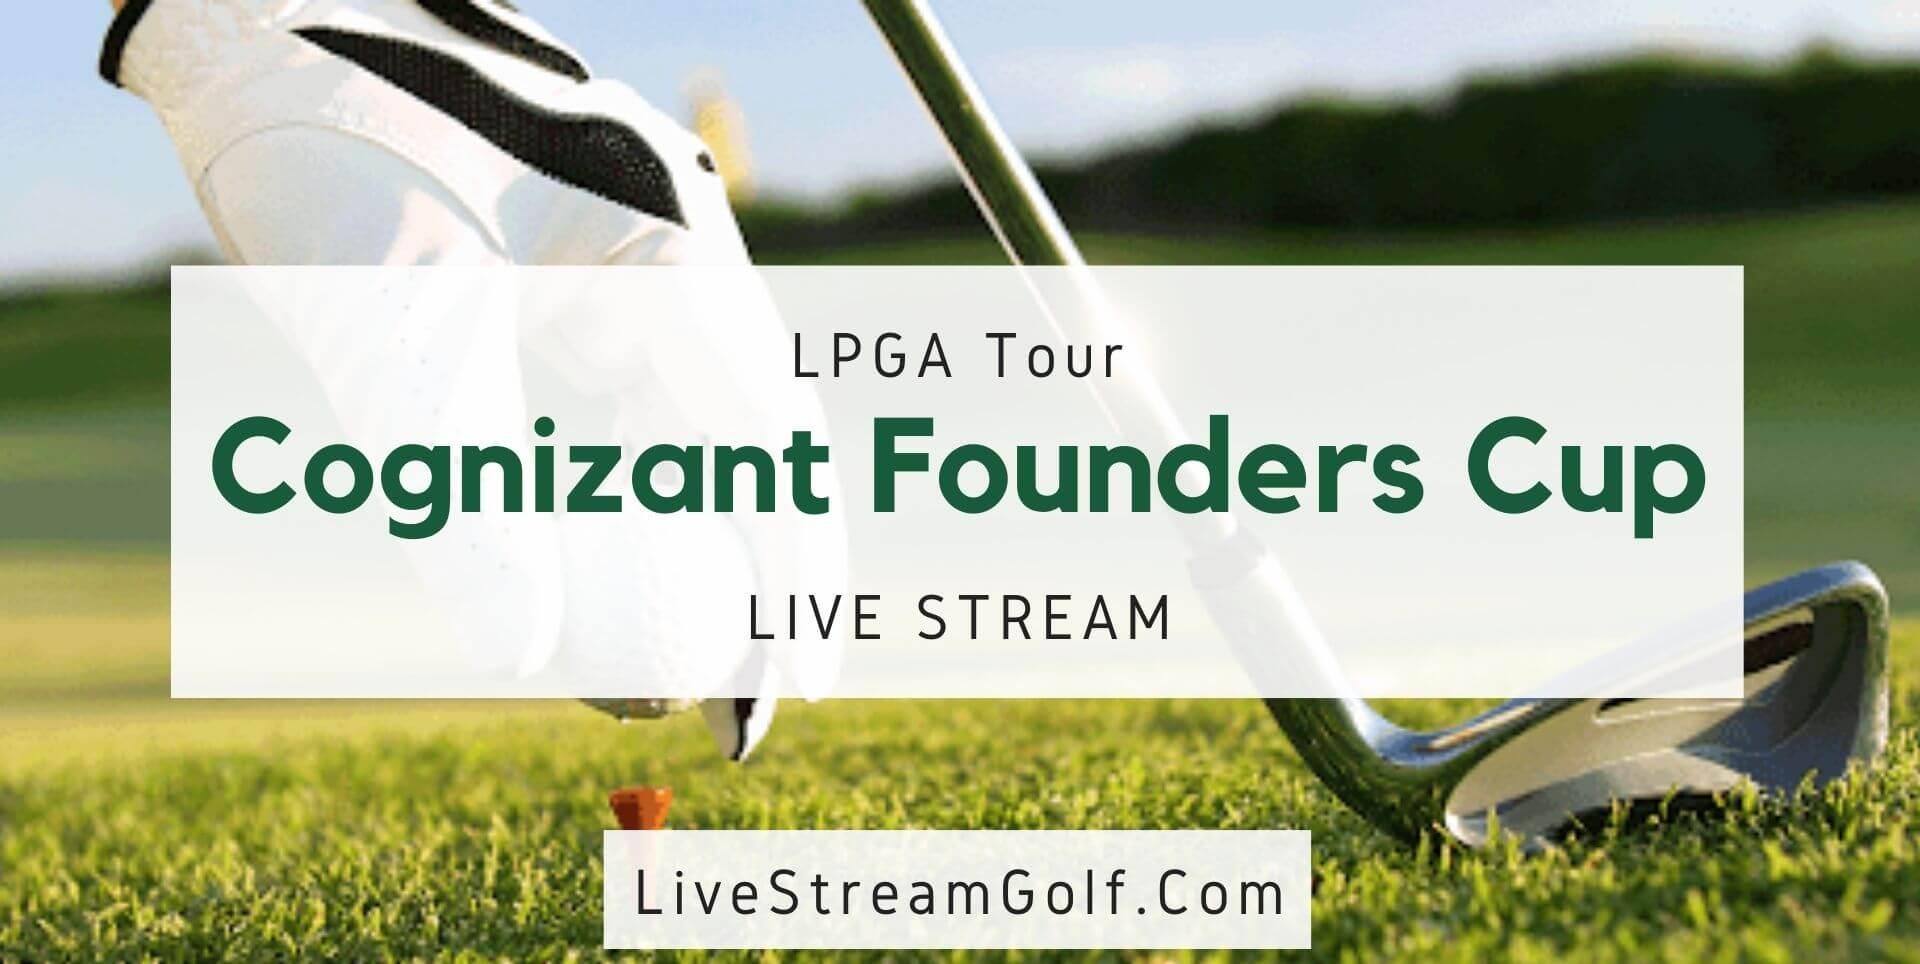 Cognizant Founders Cup Rd 1 Live Stream: LPGA Tour 2021